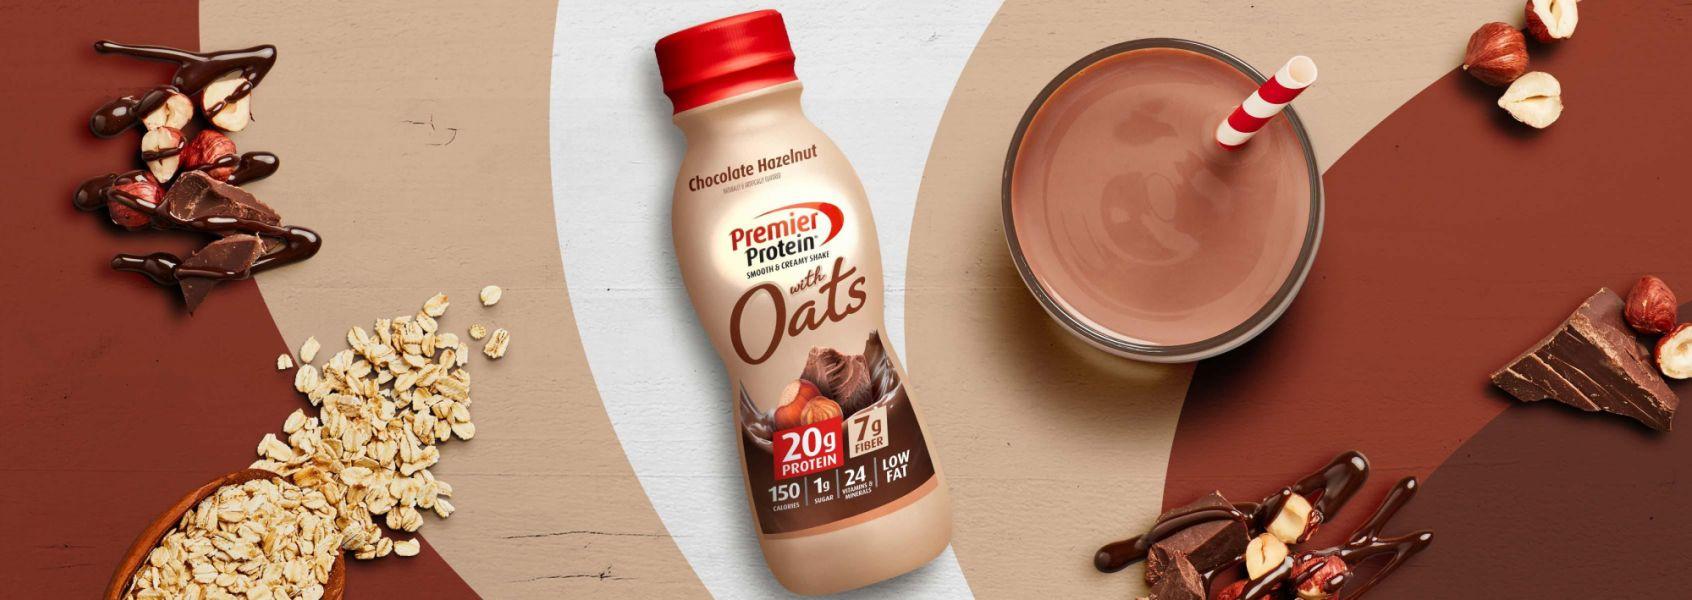 A photo of Premier Protein 11.5oz Chocolate Hazelnut Protein Shake with Oats